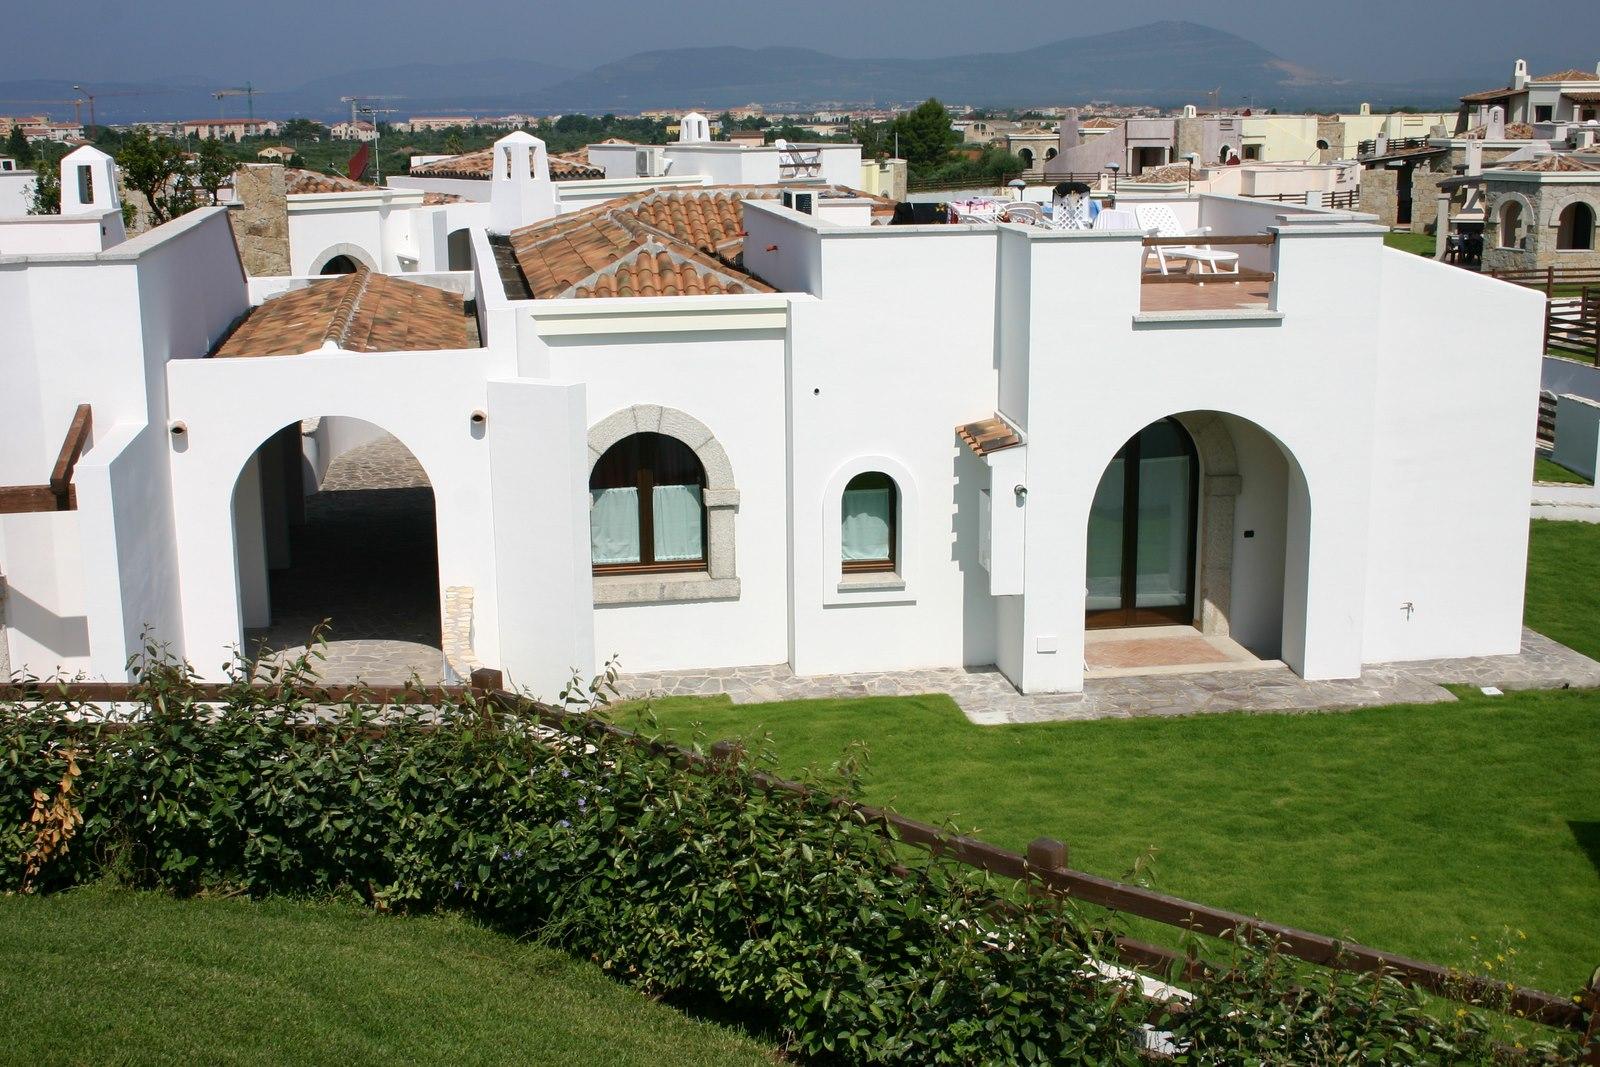 Ferienhaus Carru (877335), Sant Angelo Custode, Sassari, Sardinien, Italien, Bild 19